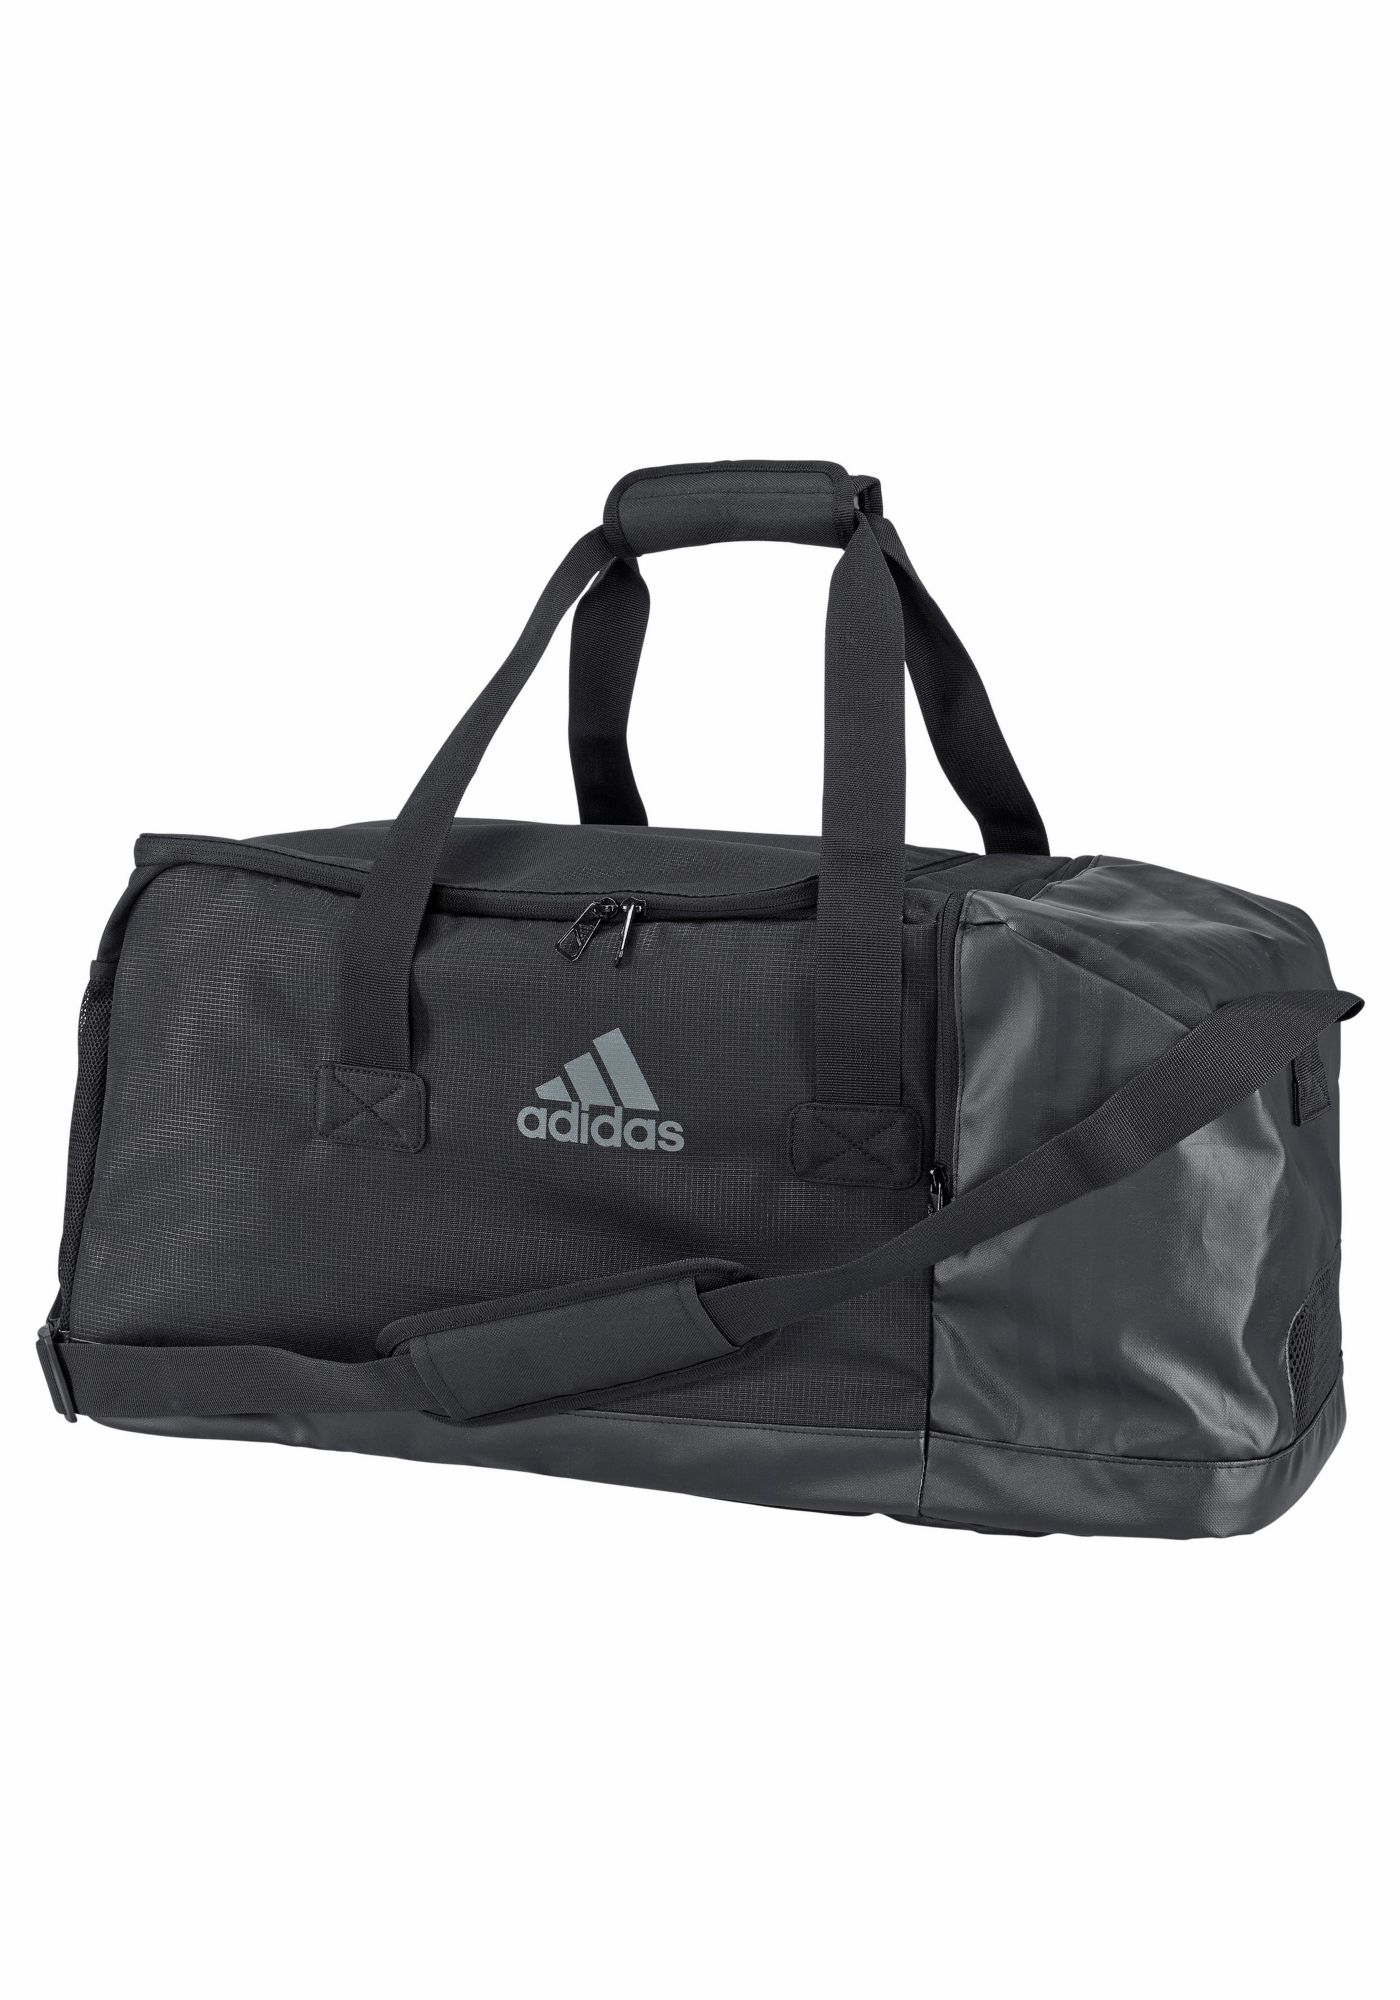 ADIDAS PERFORMANCE adidas Performance Sporttasche »3S PERFORMANCE TEAMBAG«